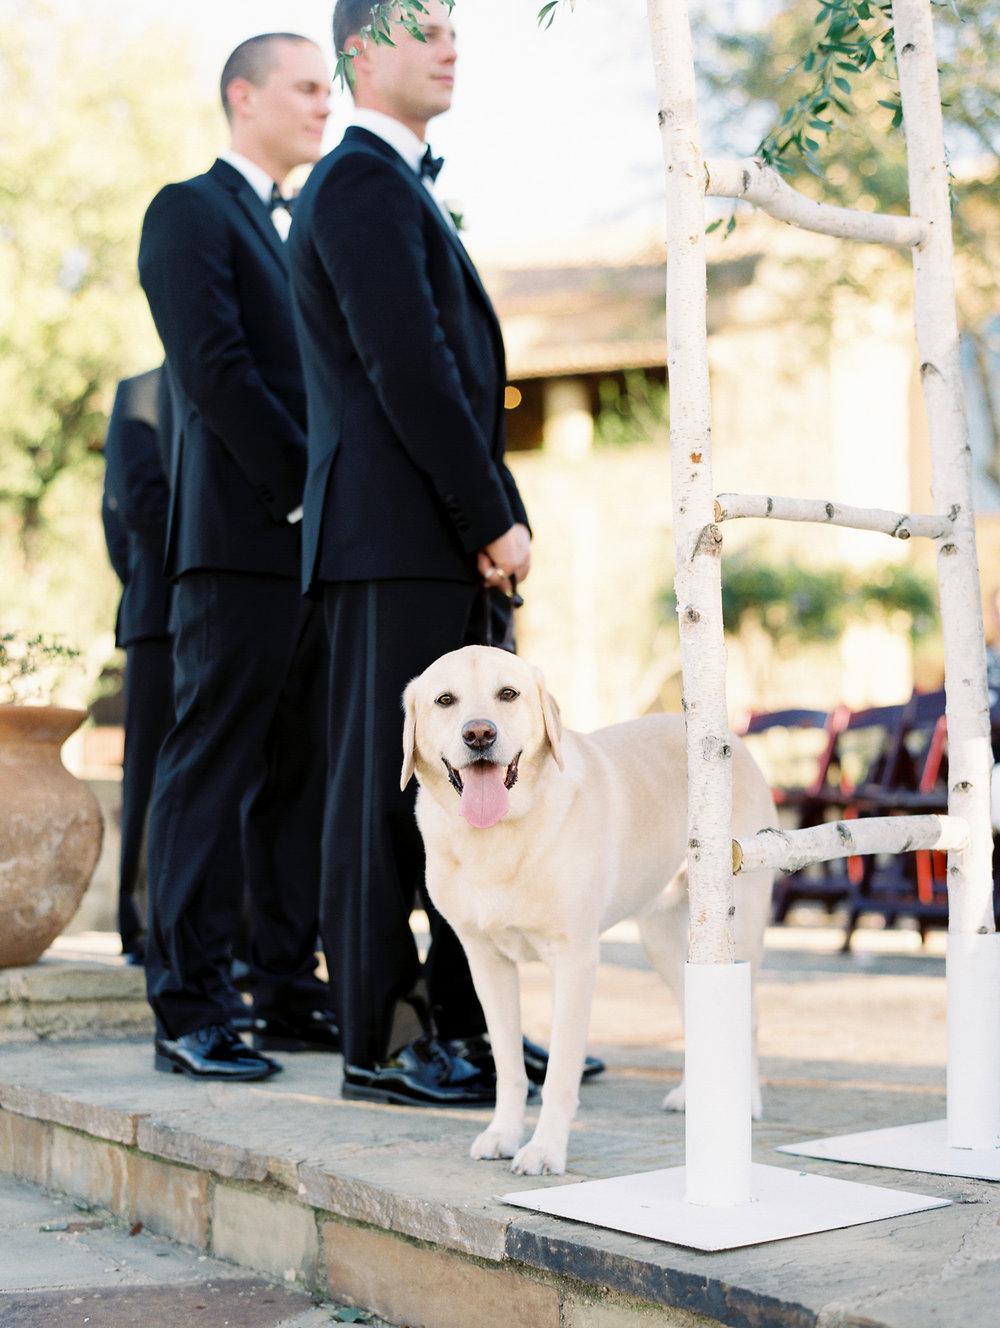 Escondido-Golf_Lake-Club-Hill-Country-Houston-Wedding-Photographer-Best-Top-Luxury-Destination-Engagements-Portrait-Austin-Photography-93.jpg